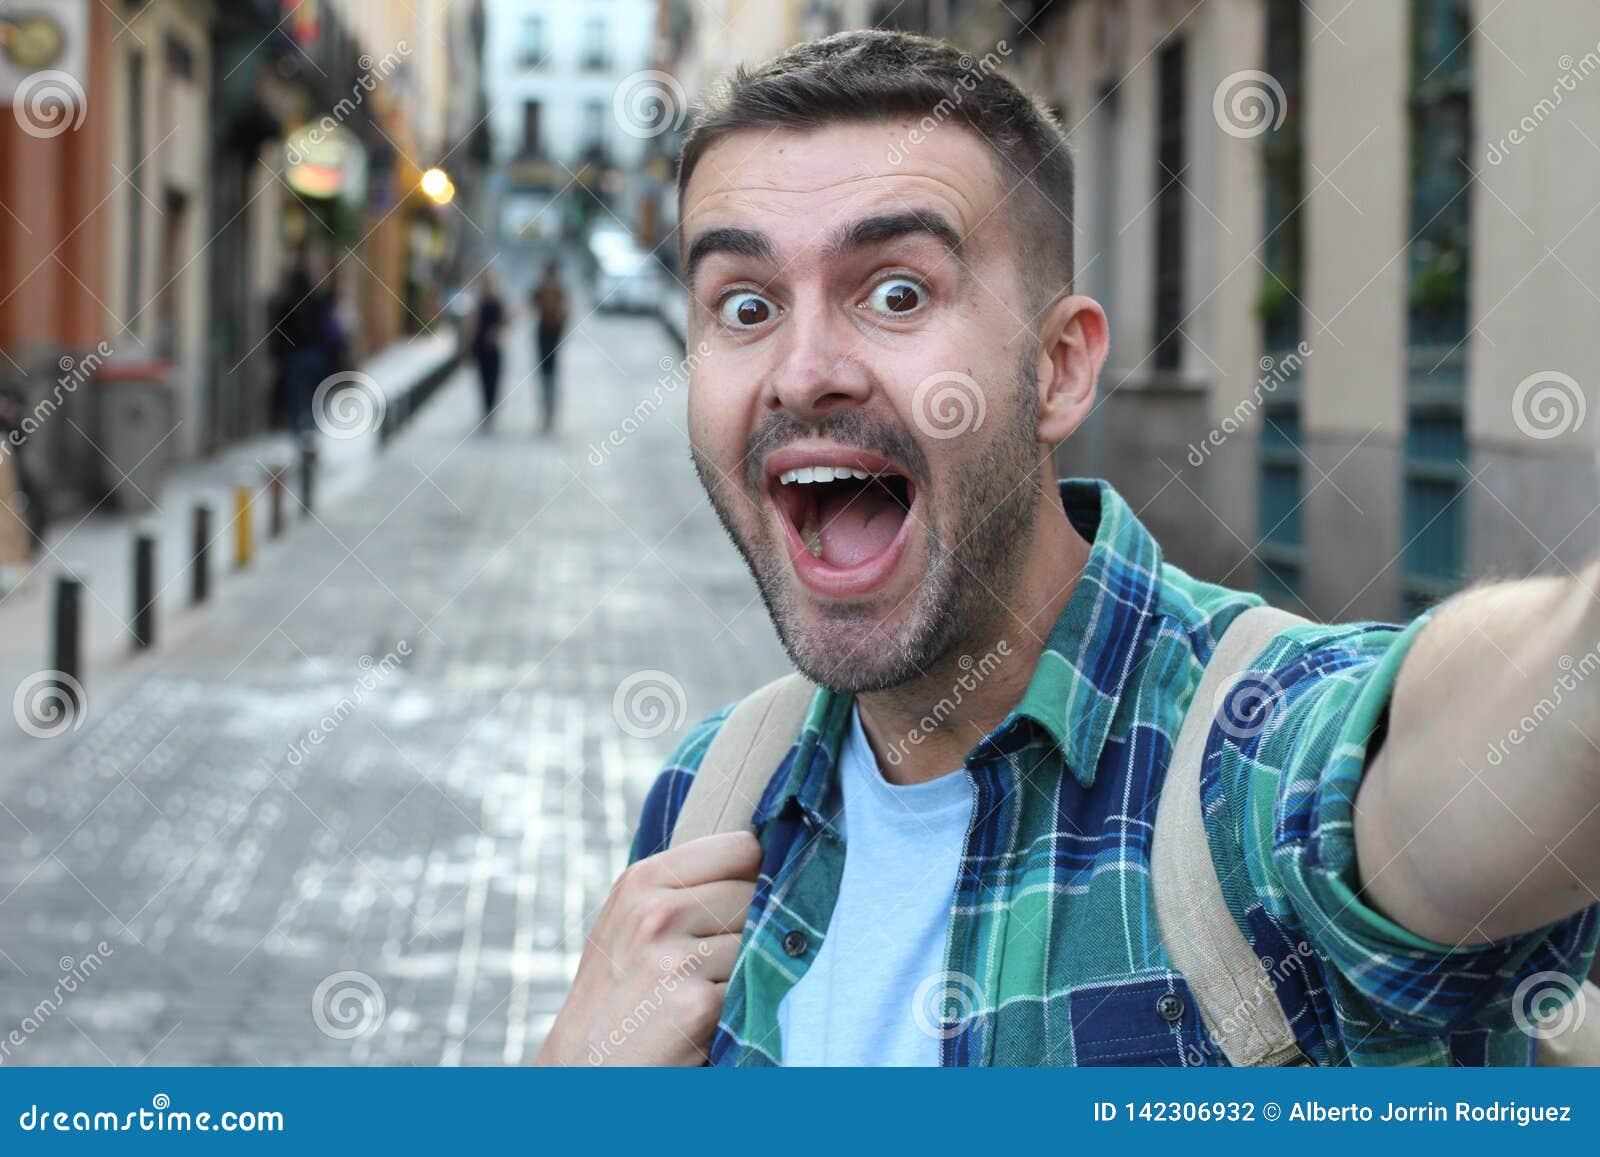 Surprised ecstatic man taking a selfie